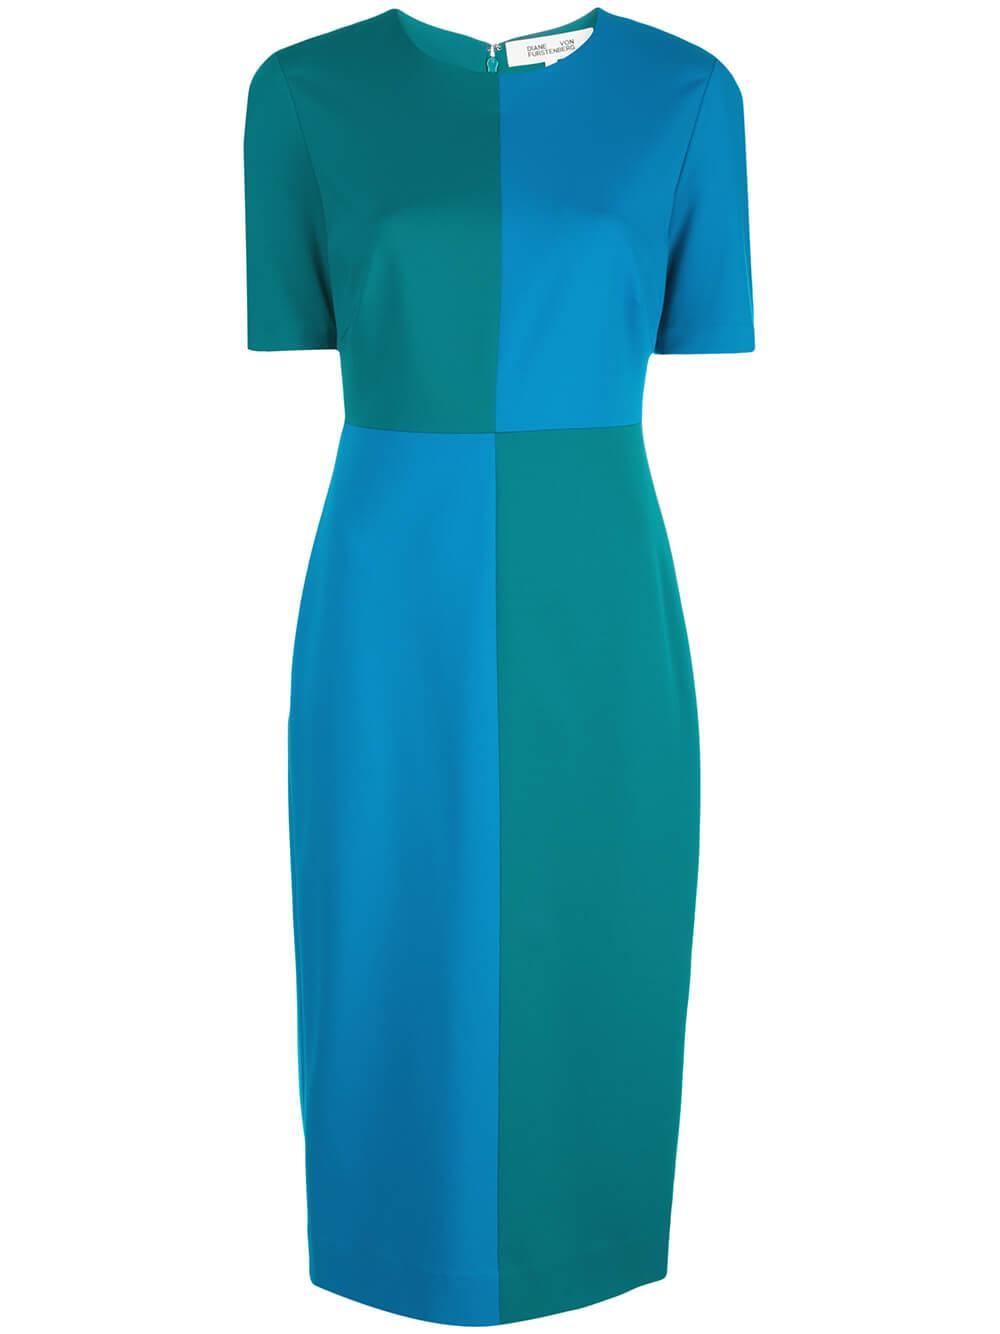 Davis Short Sleeve Colorblock Midi Dress Item # 13724DVF